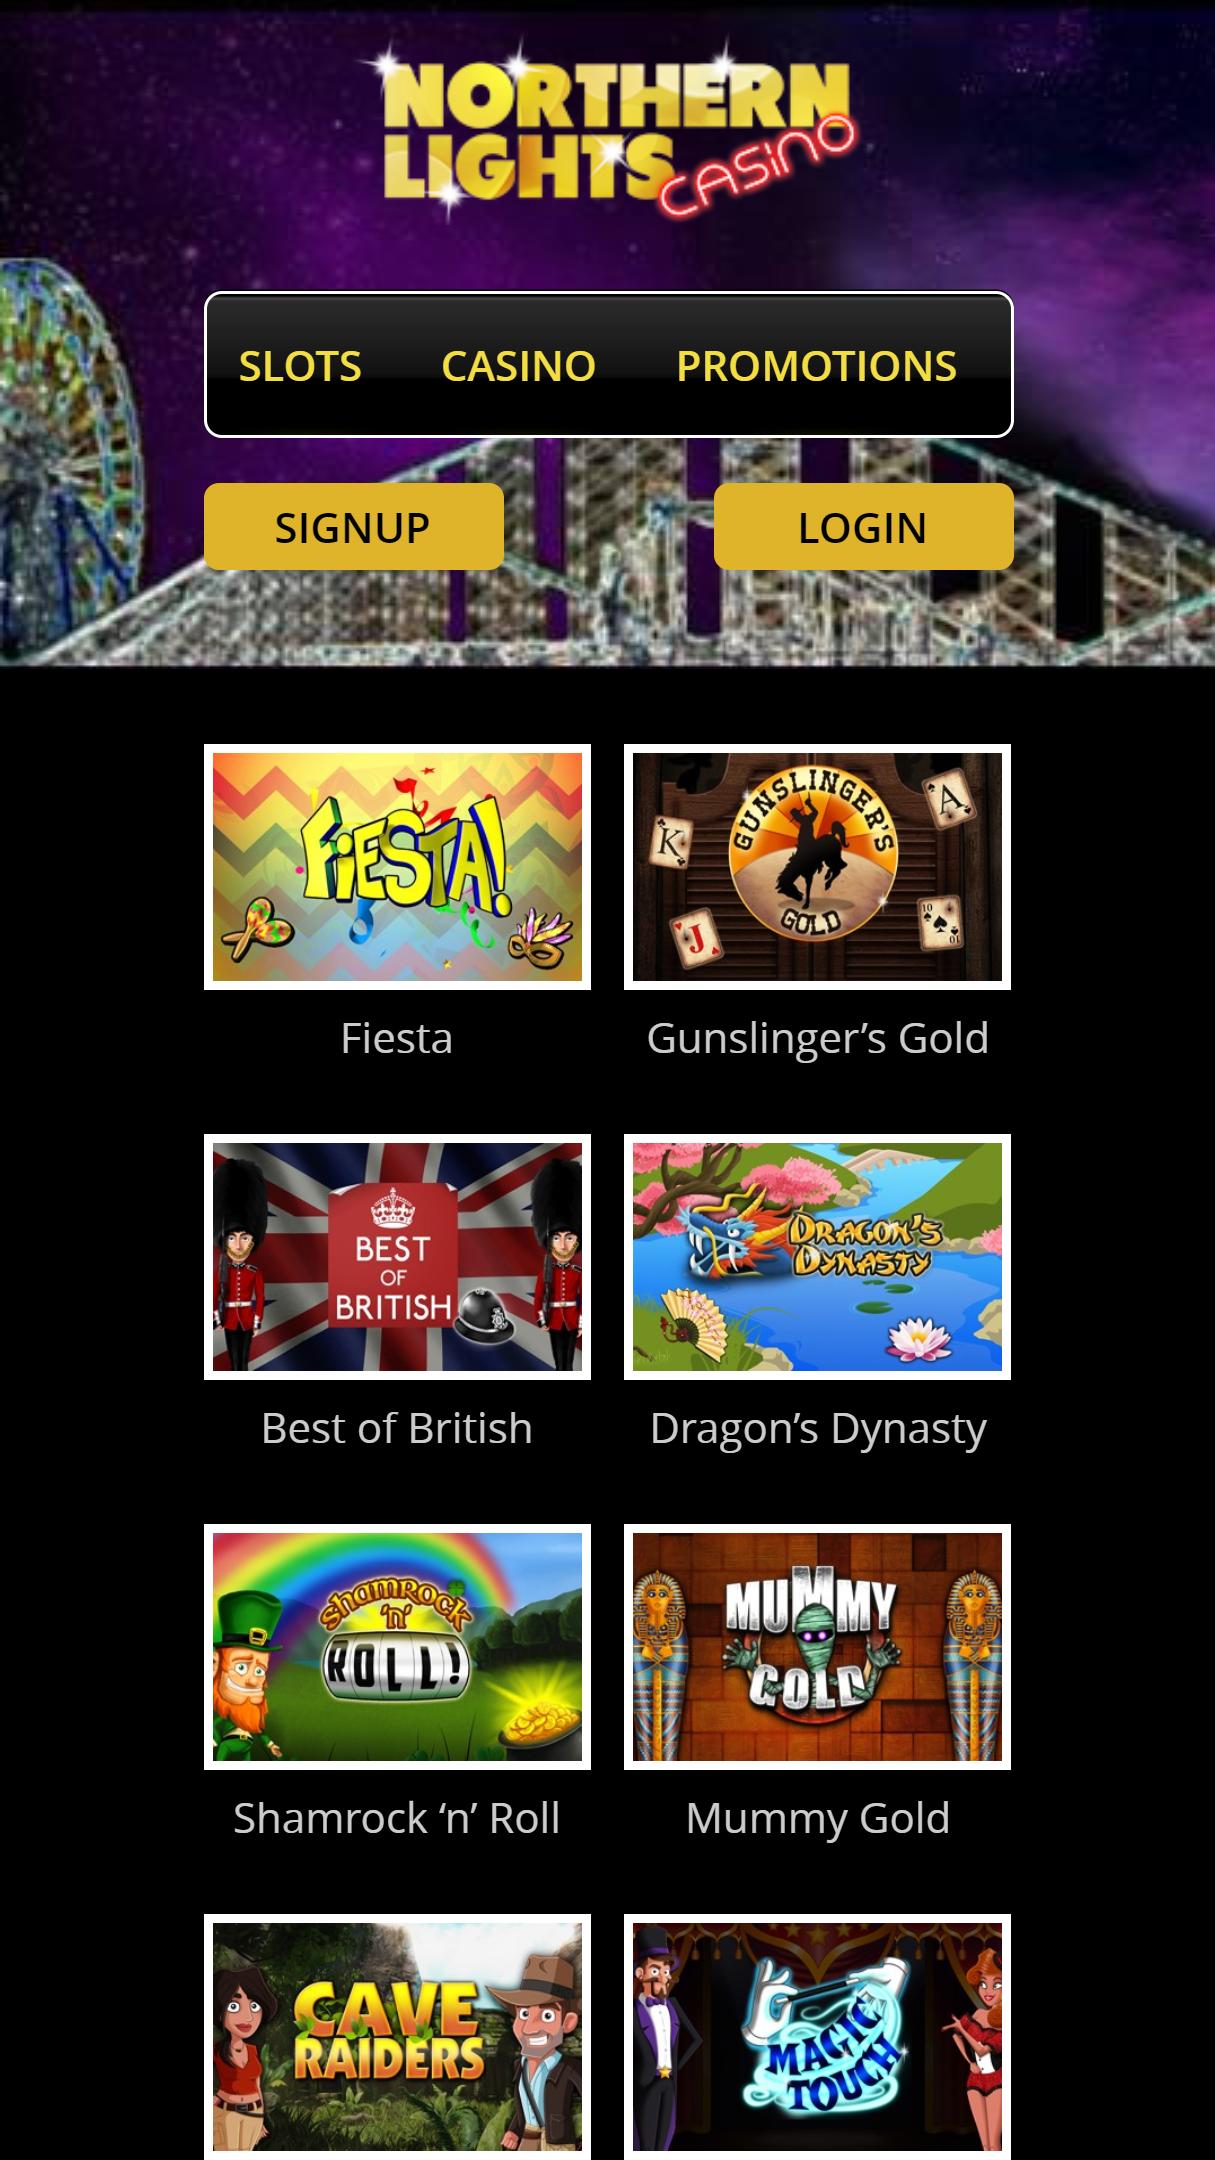 Northern Lights Casino App Homepage